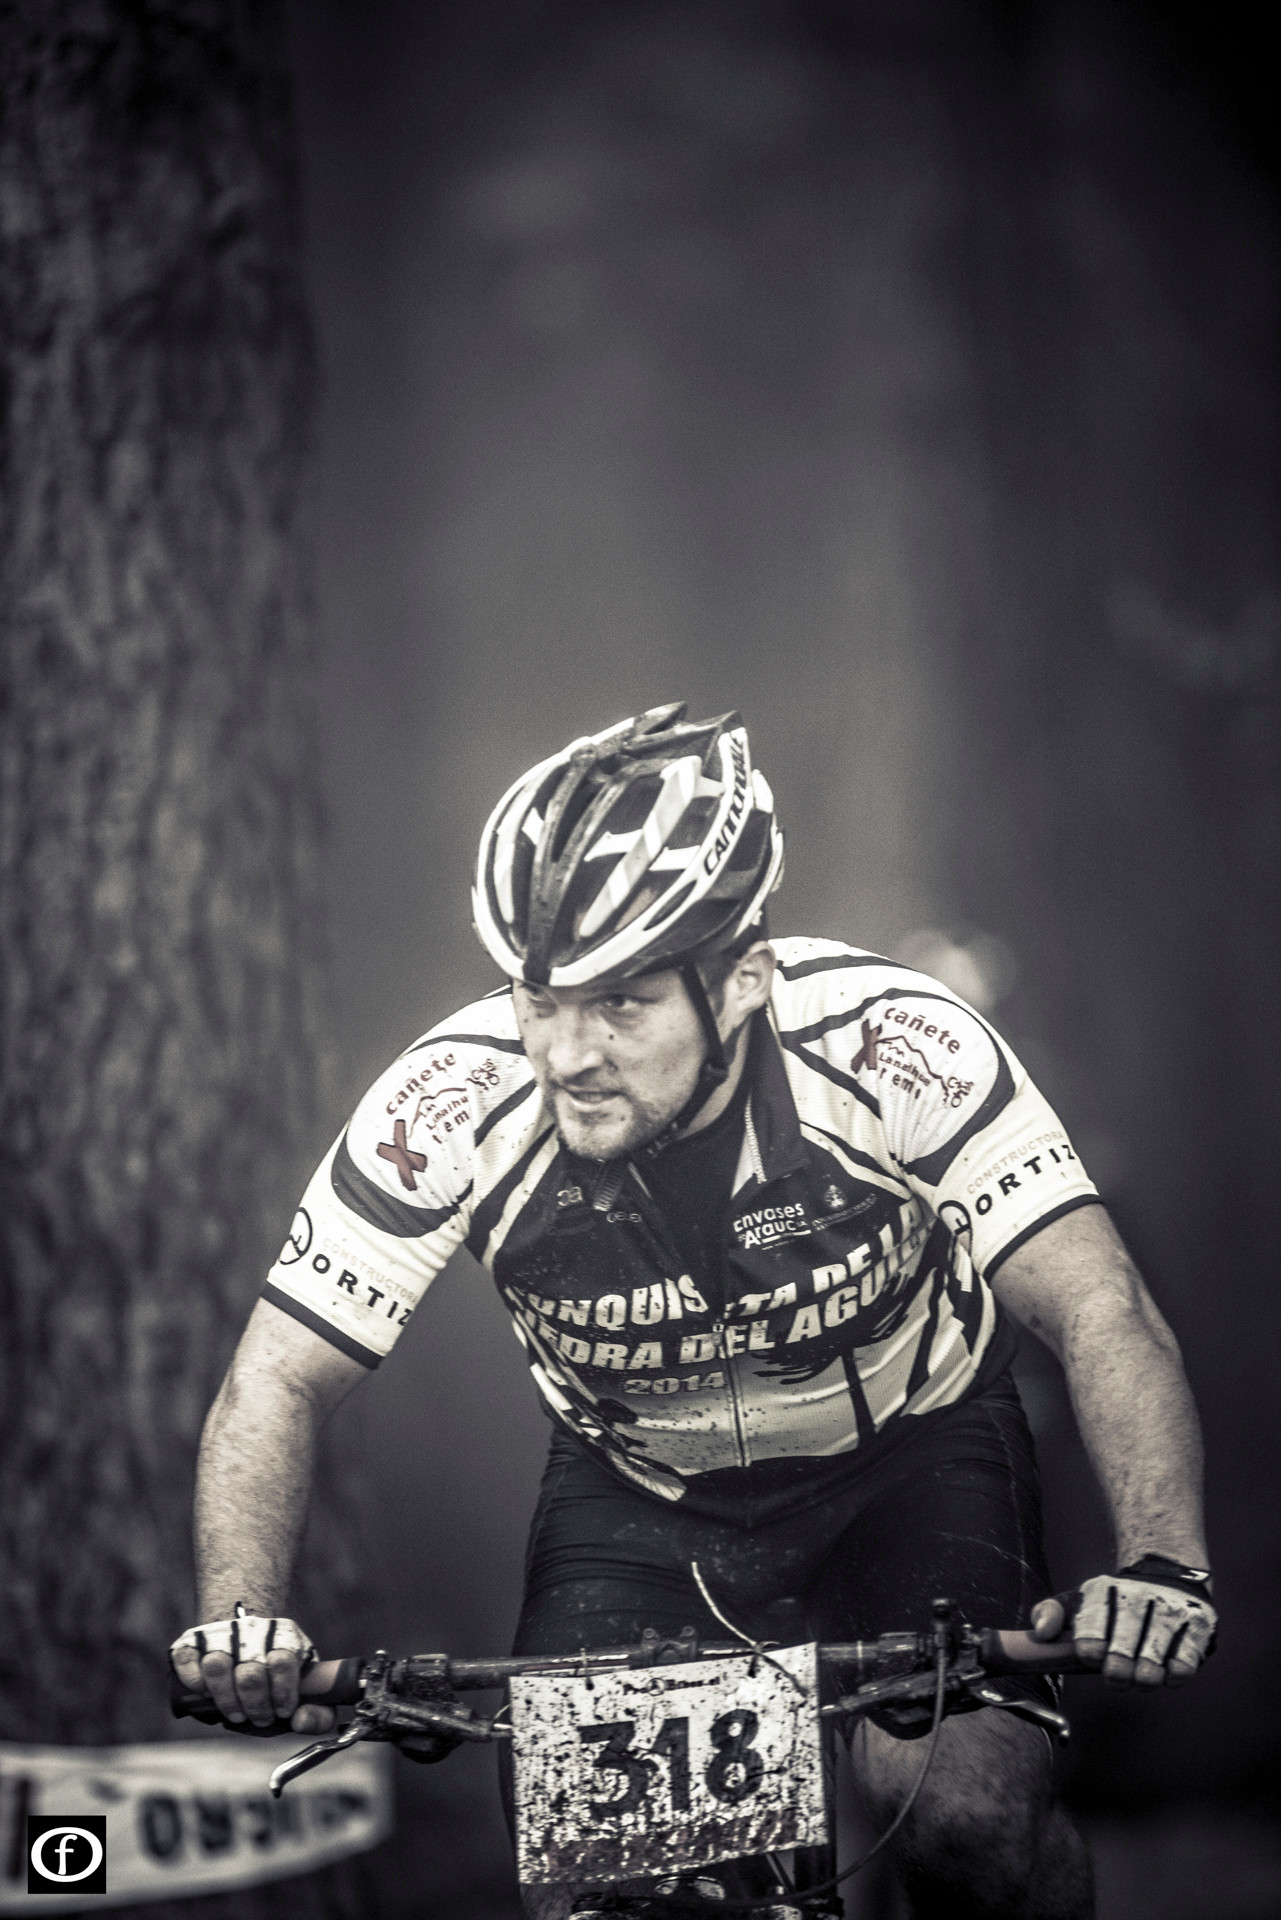 2015-05-17-Ciclismo Enduro-45.jpg